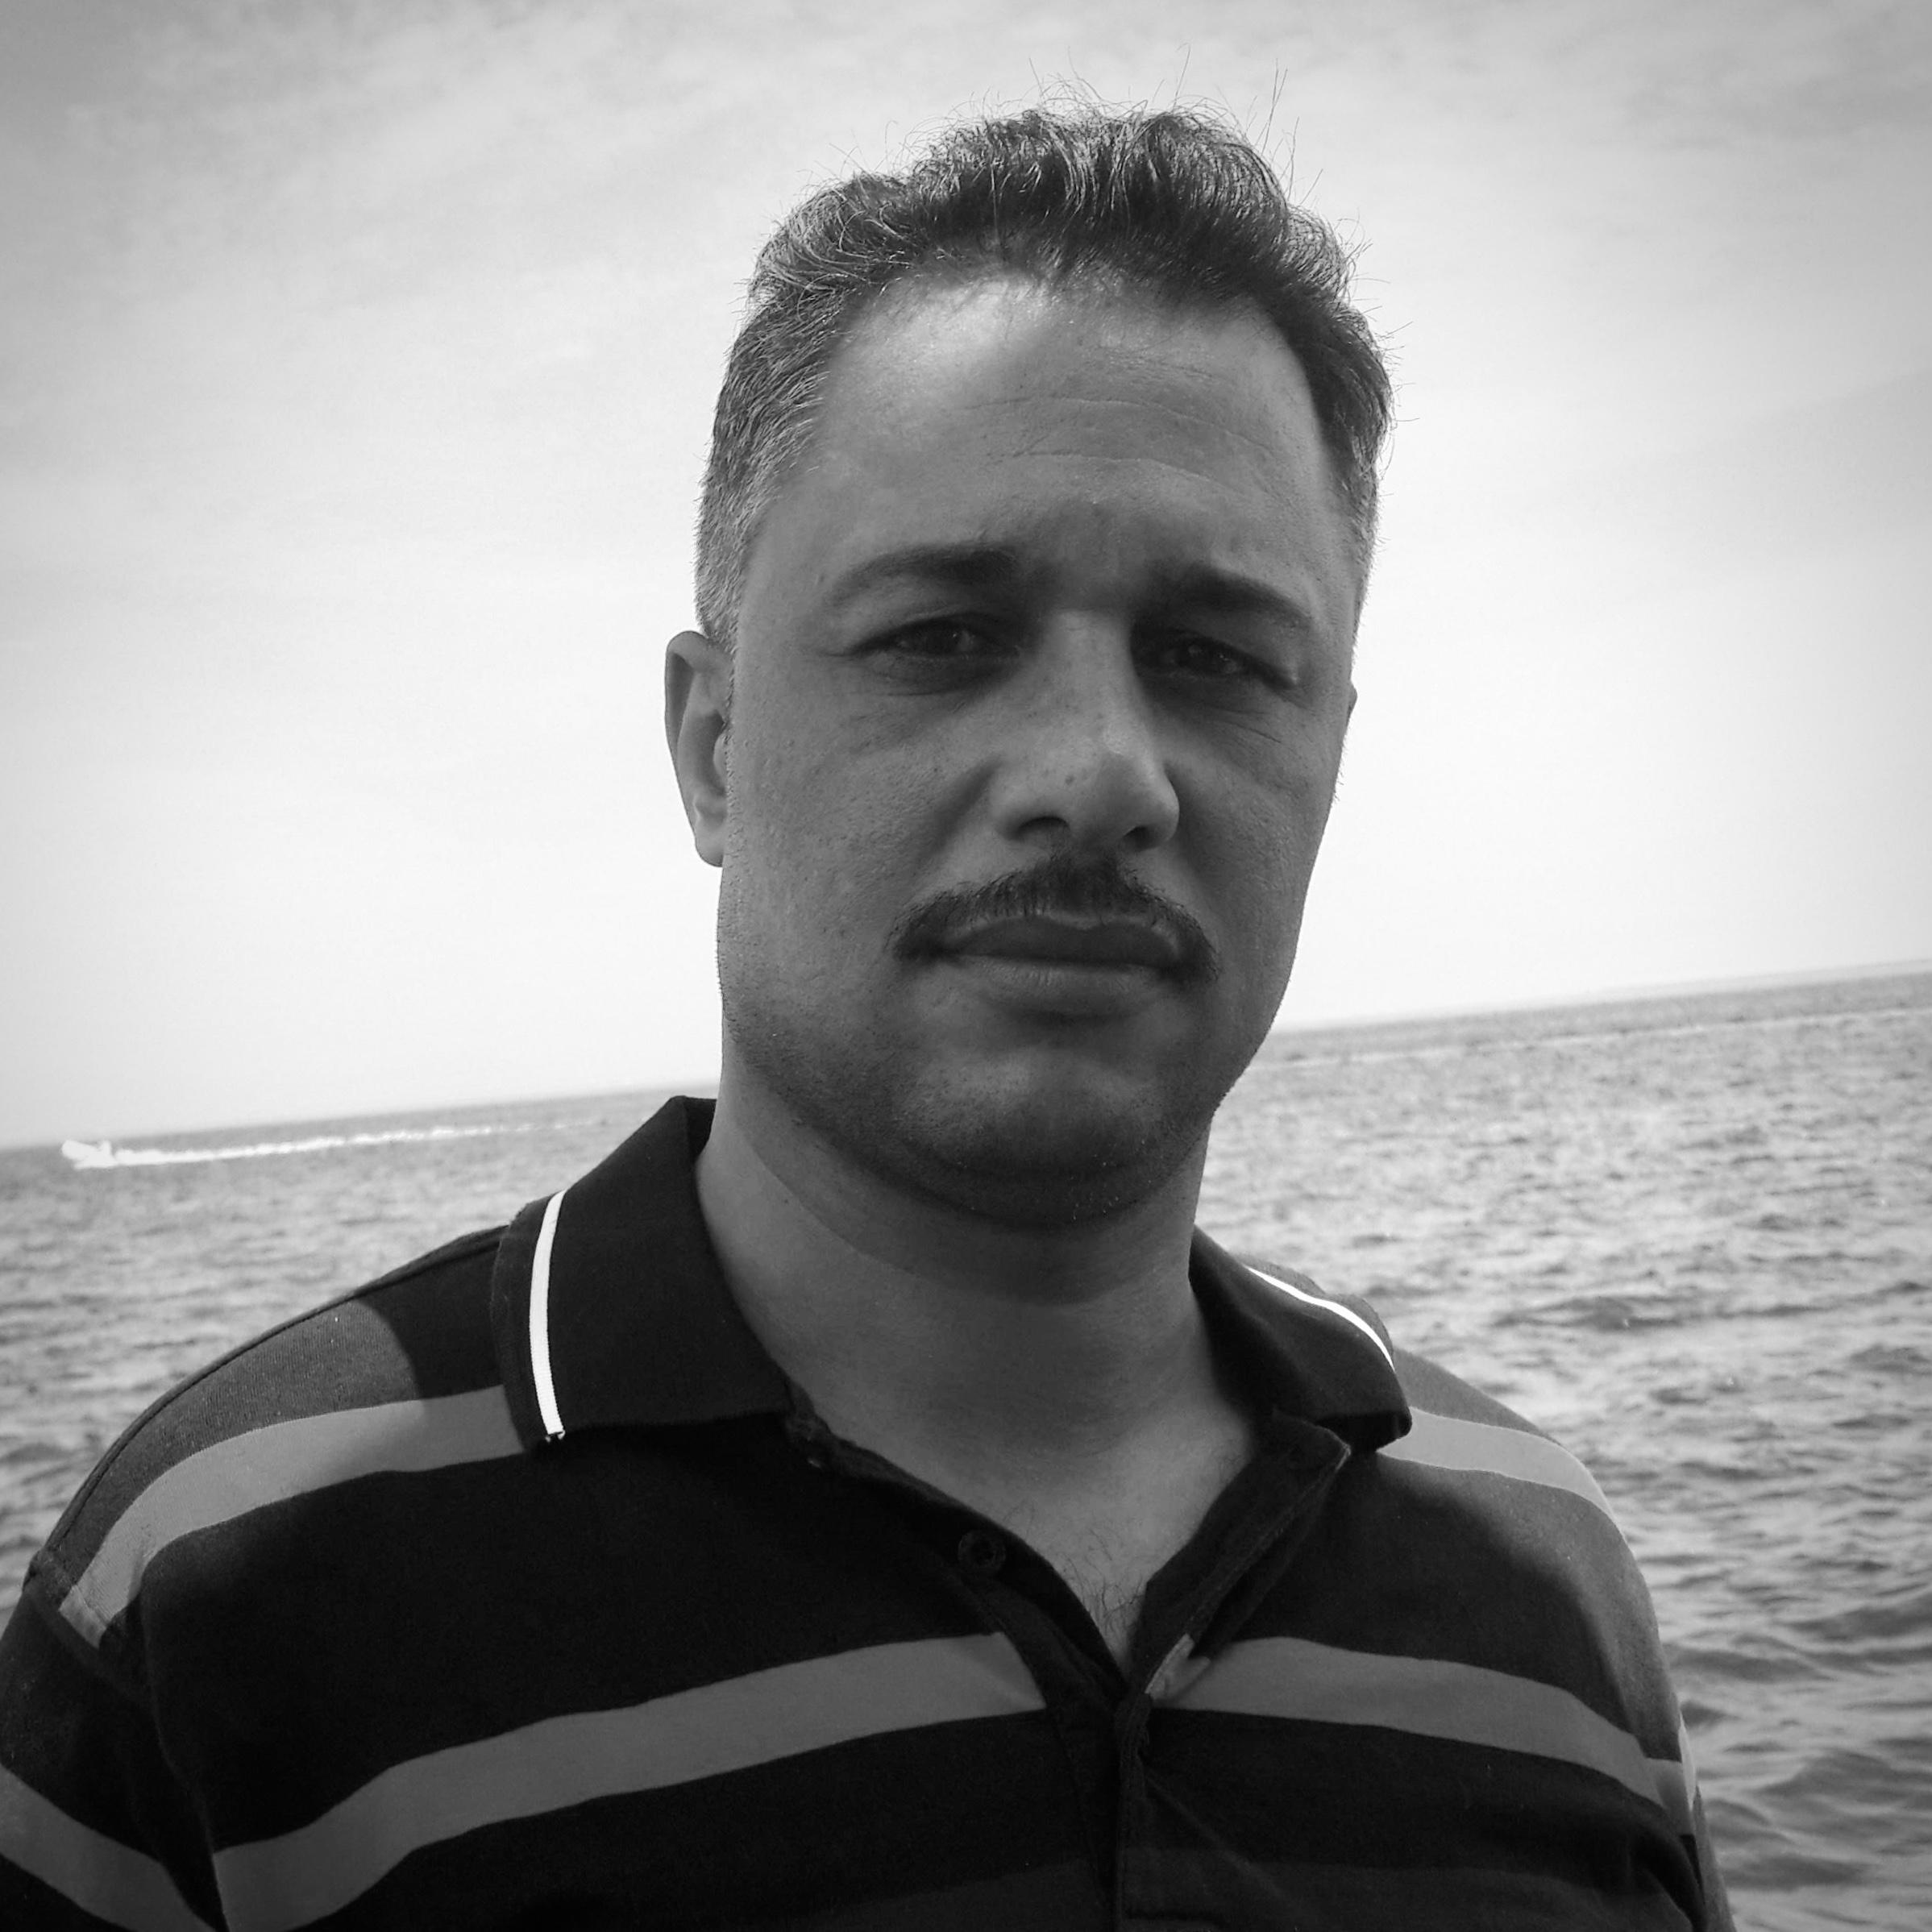 Hany Ameen